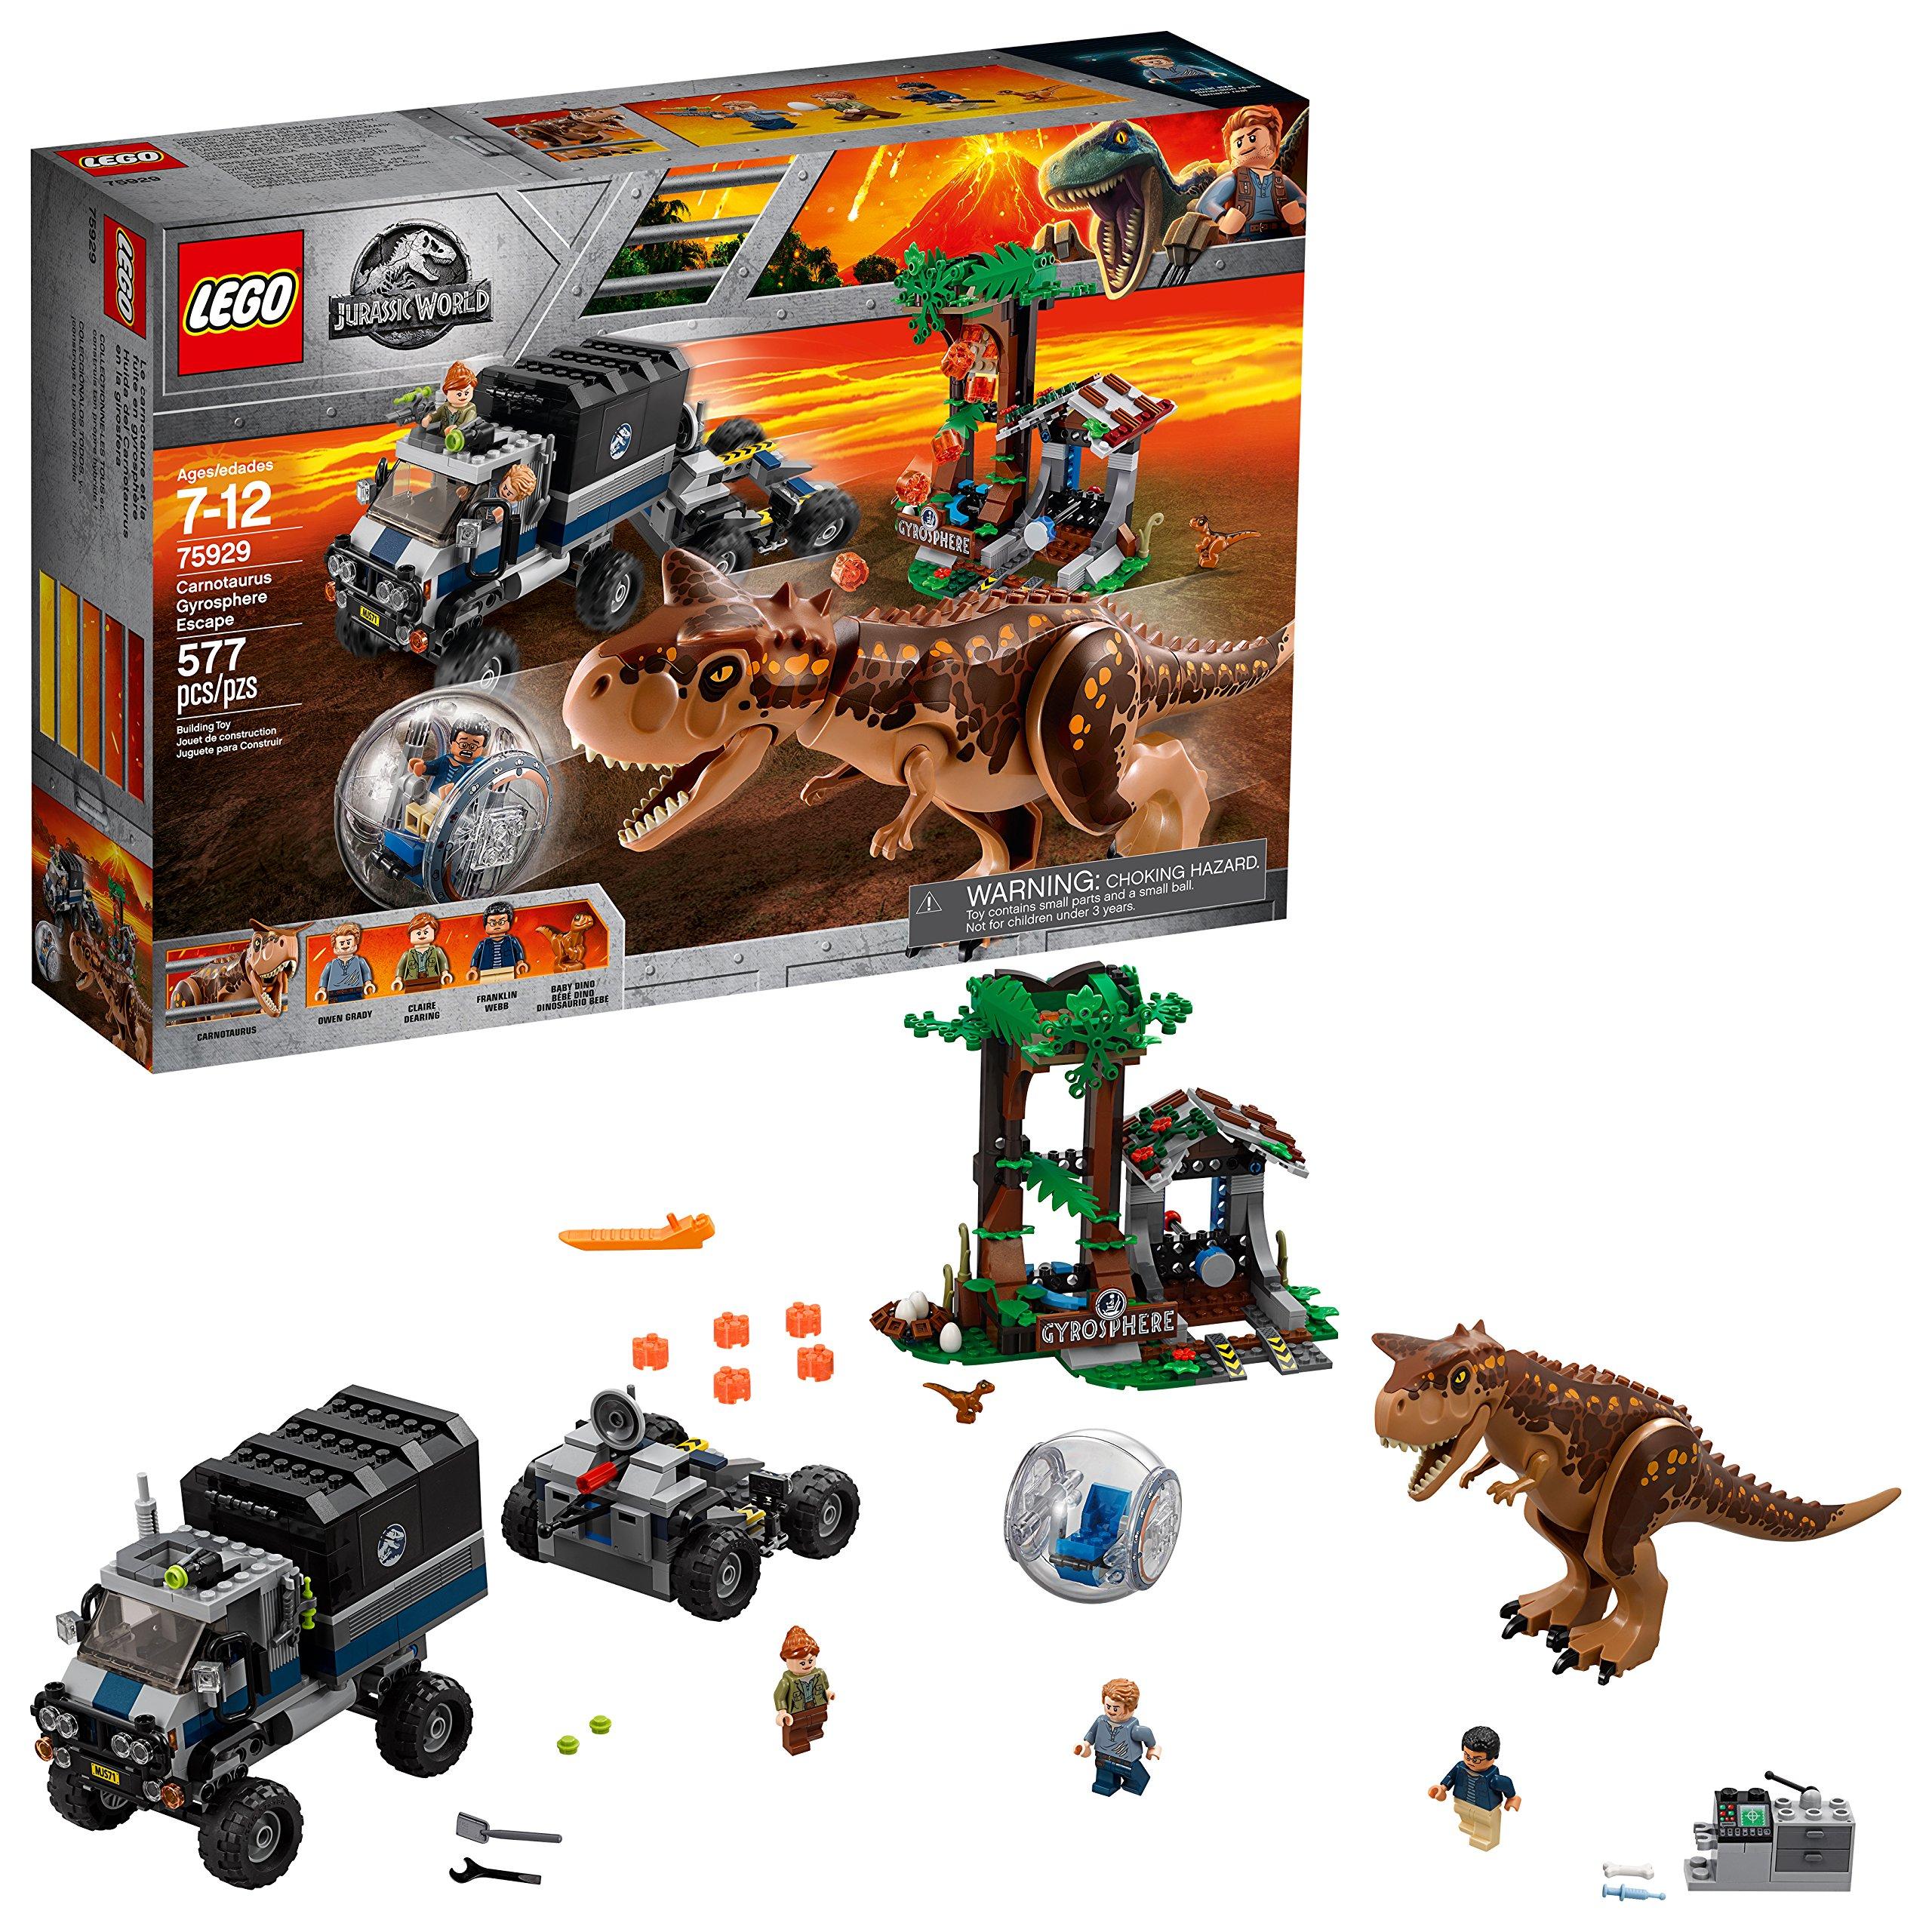 LEGO Jurassic World Carnotaurus Gyrosphere Escape 75929 Building Kit (577 Piece)